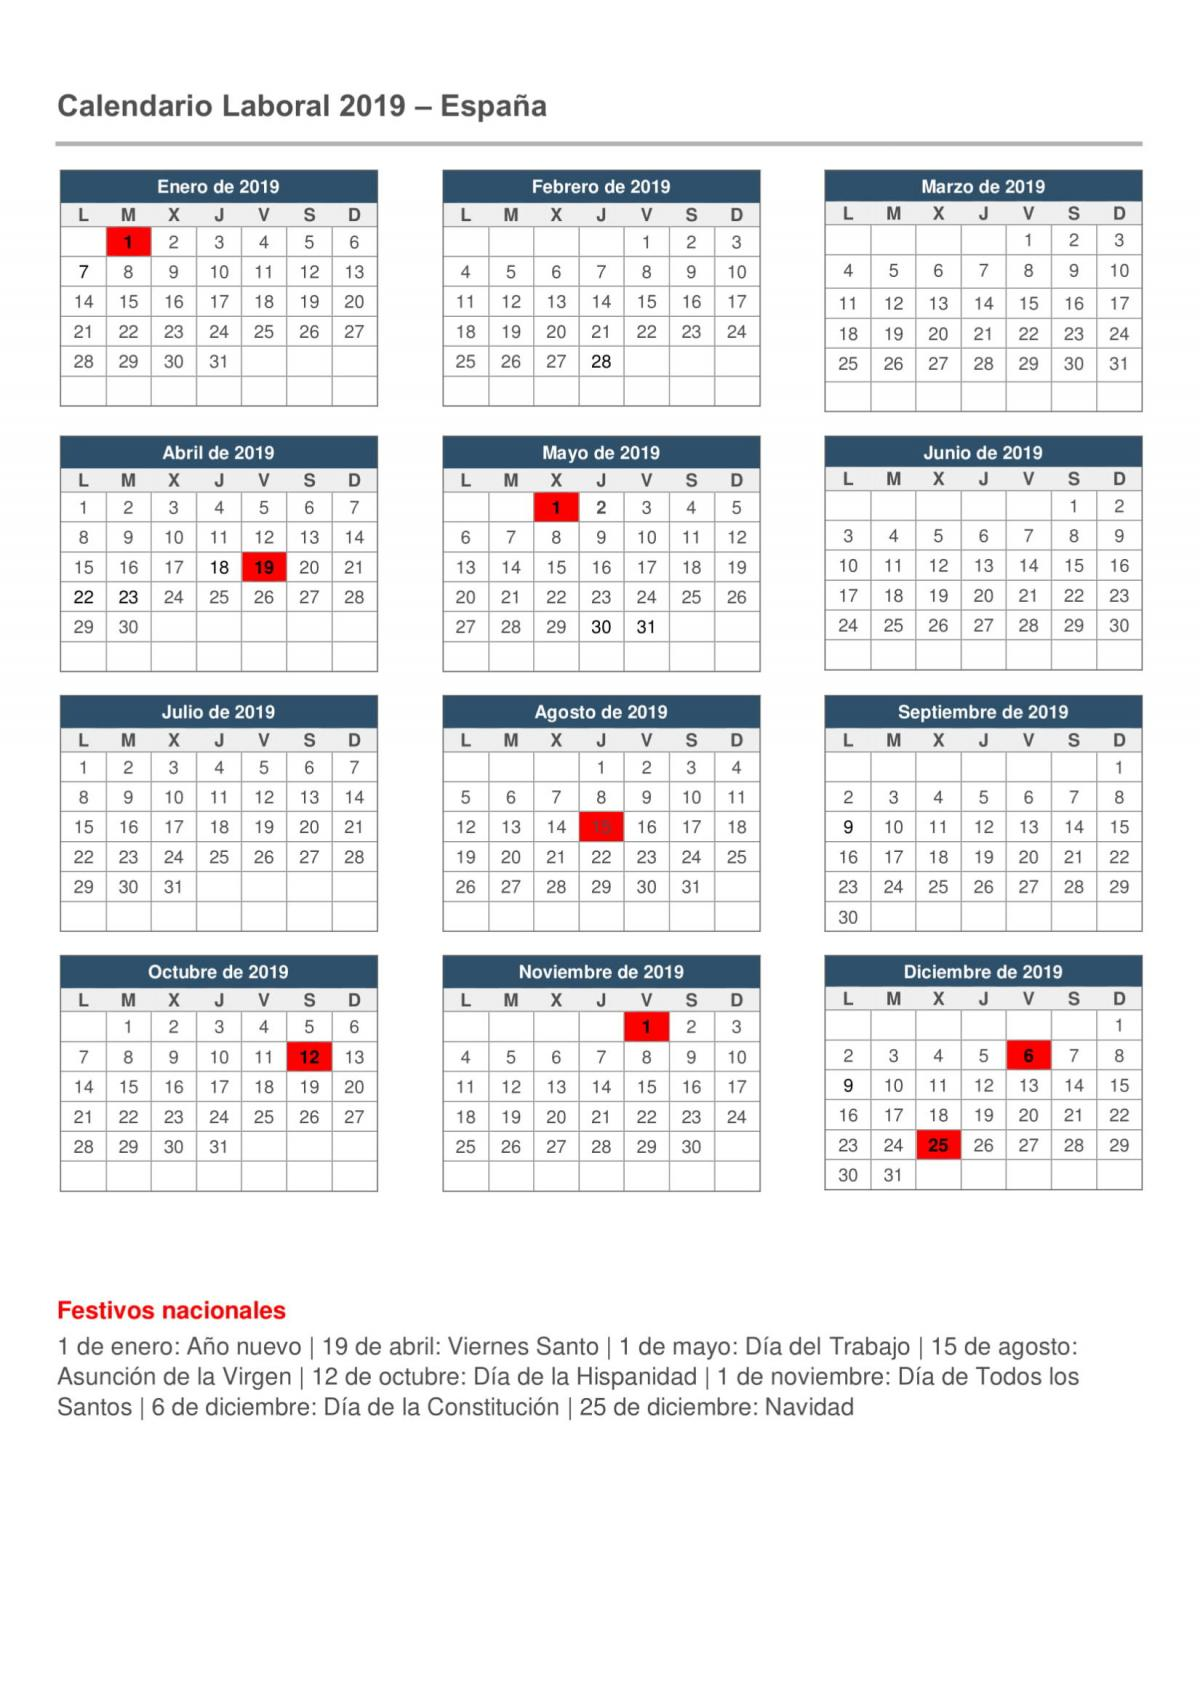 UGT FICA País Valencià - Calendario Laboral 2019